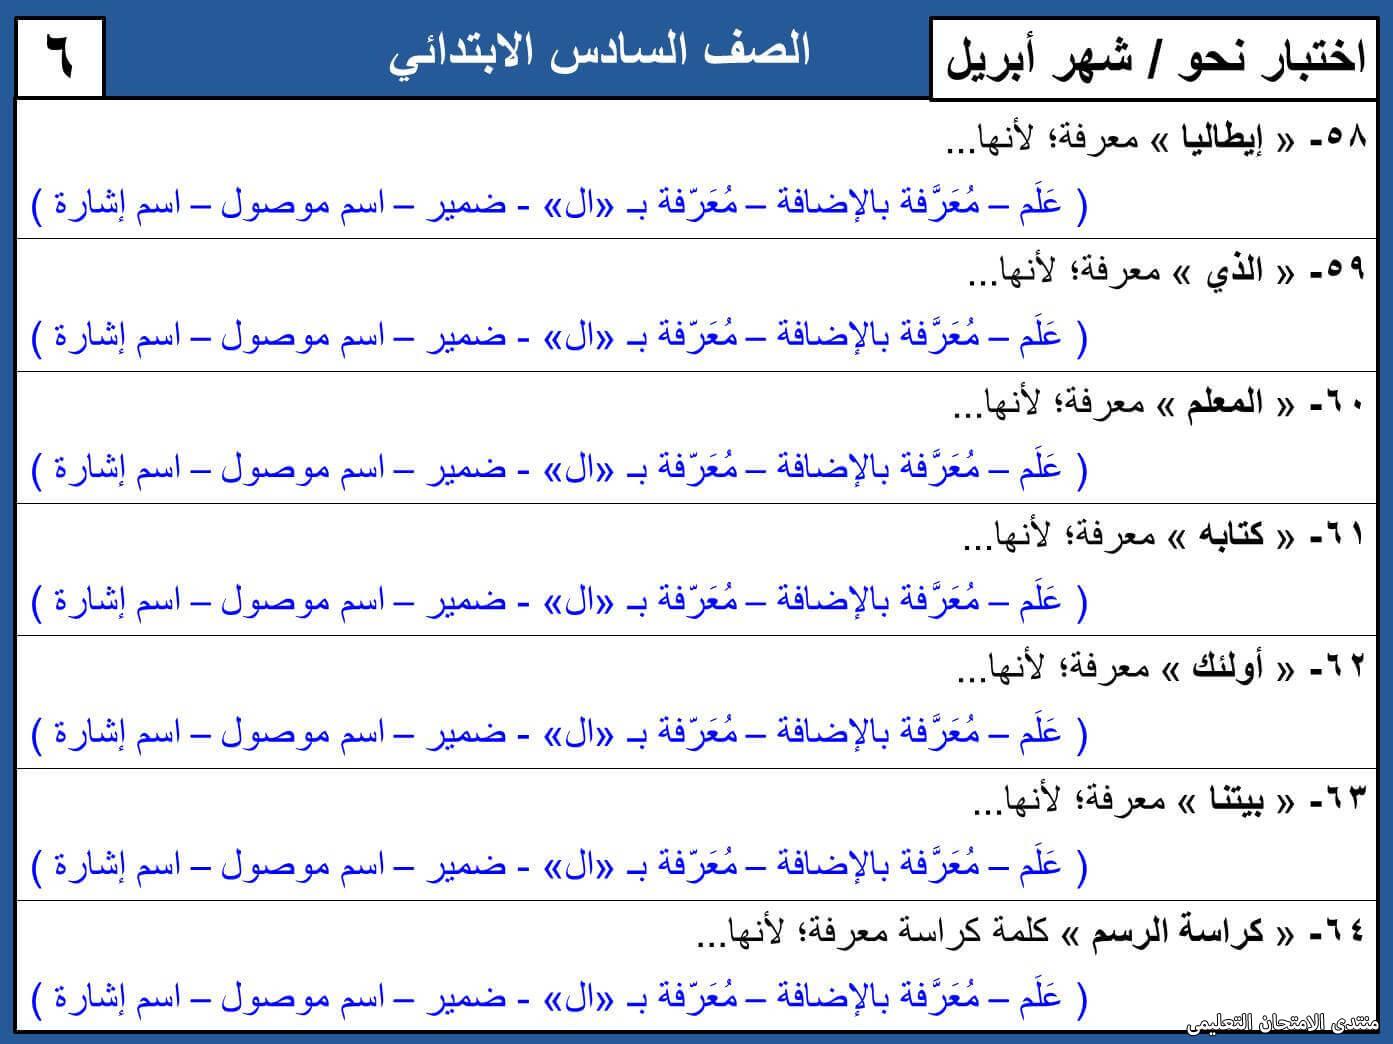 exam-eg.com_16185251889886.jpg